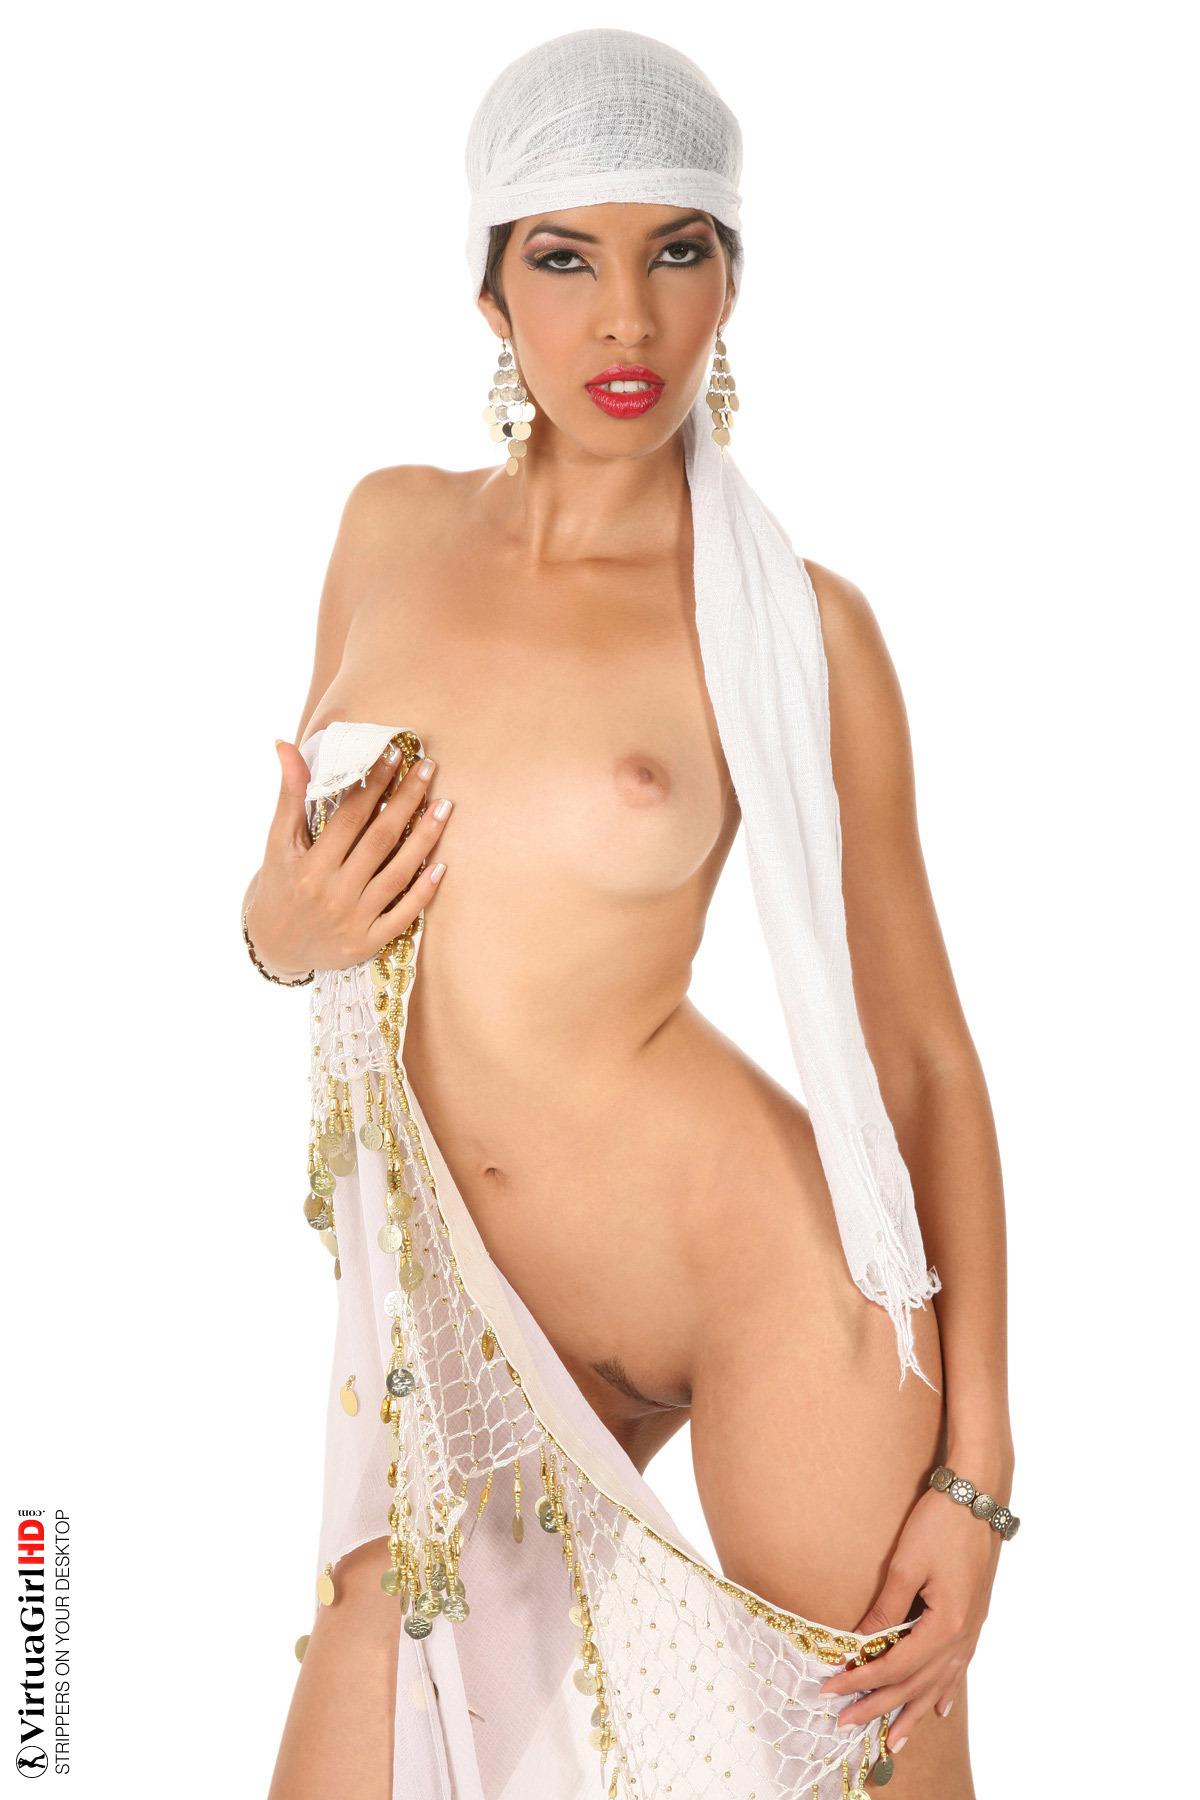 pretty girls stripping naked